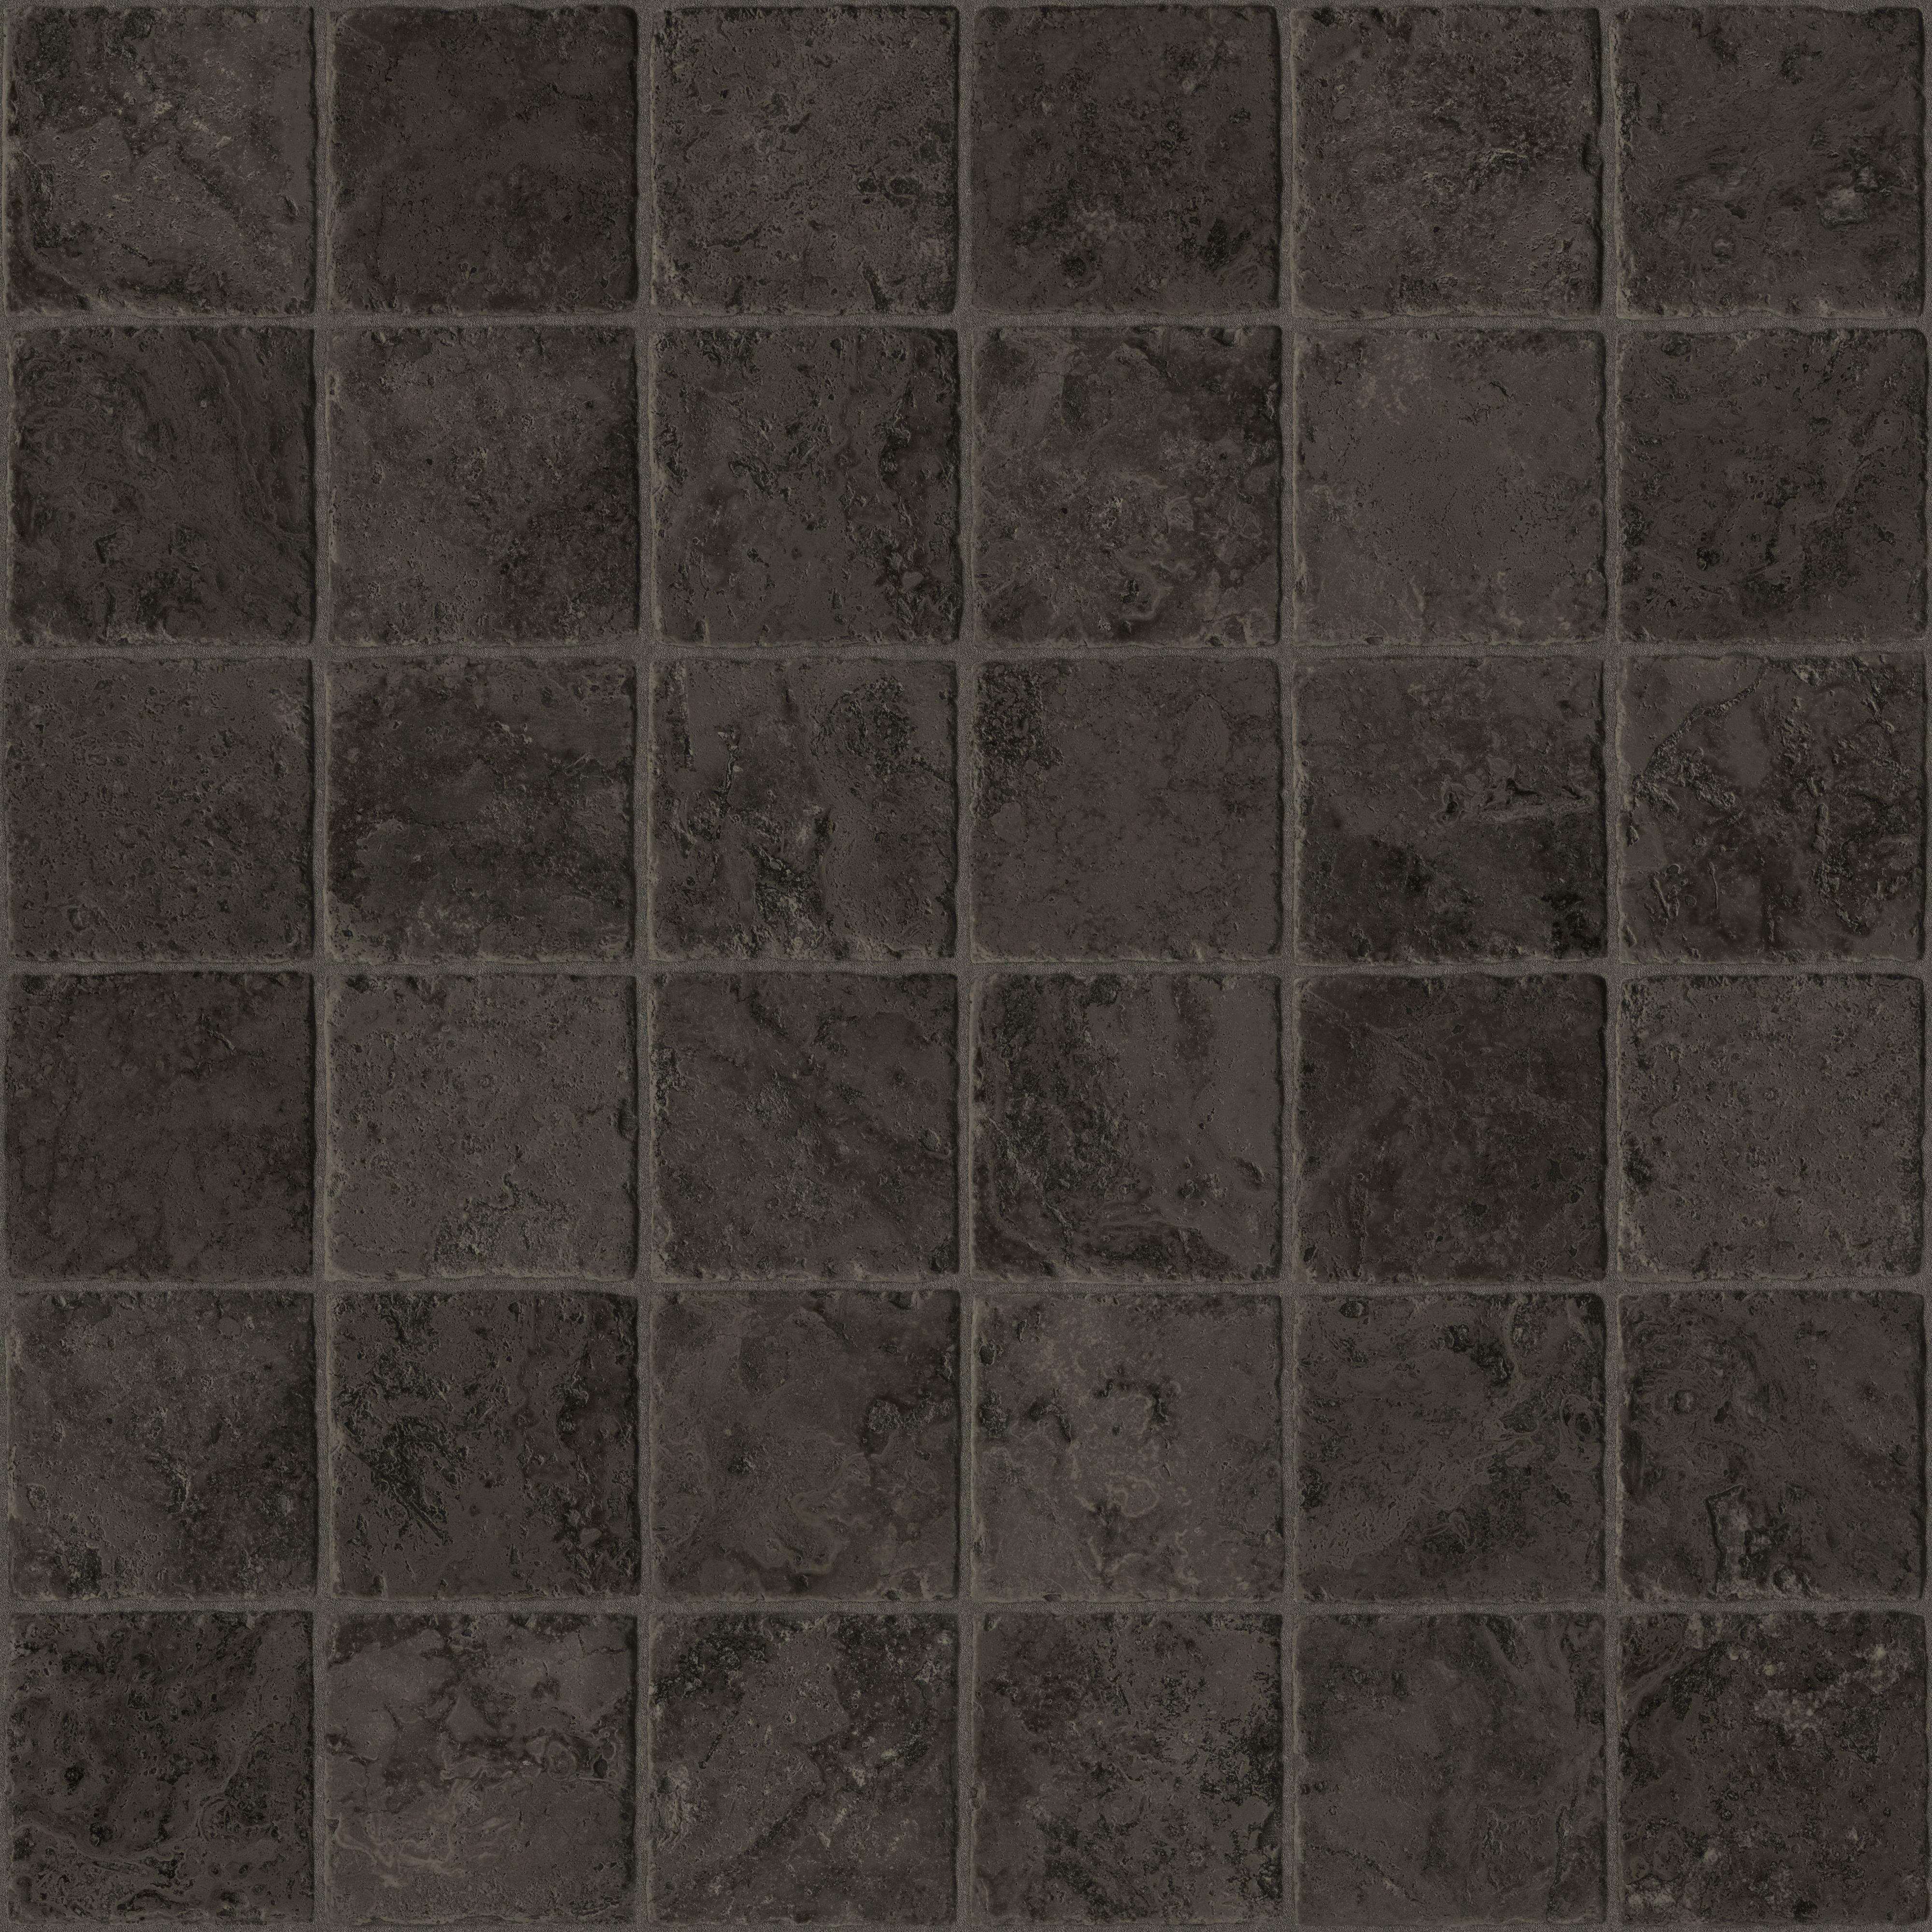 Sedrano Black Stone Tile Effect Vinyl Cut To Chosen Length In Store